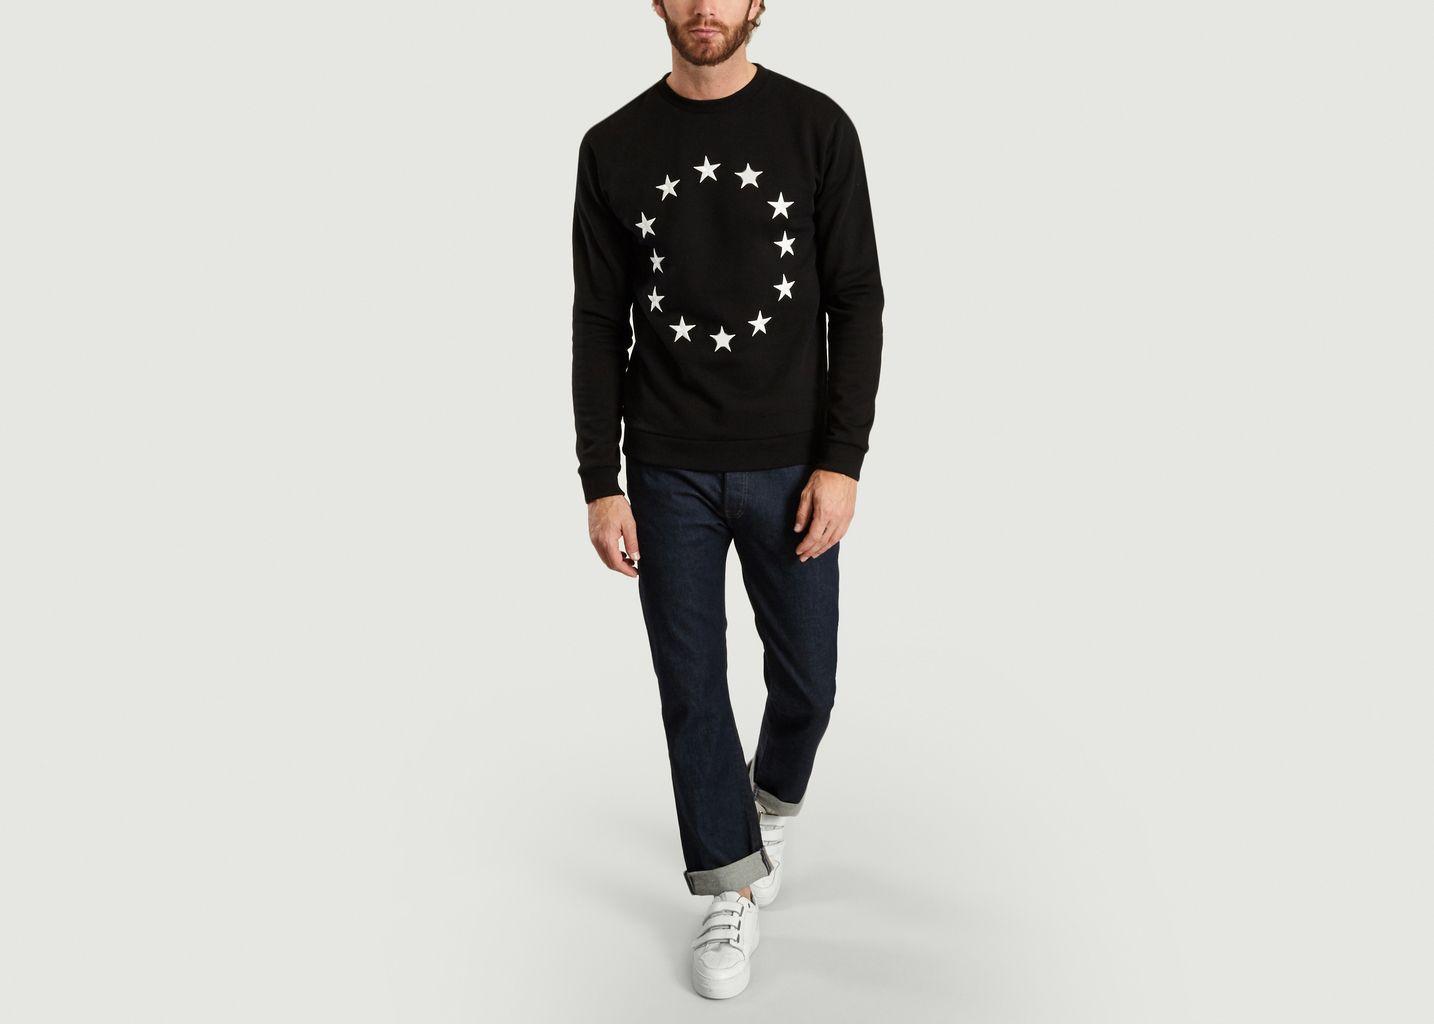 Sweatshirt Europa - Études